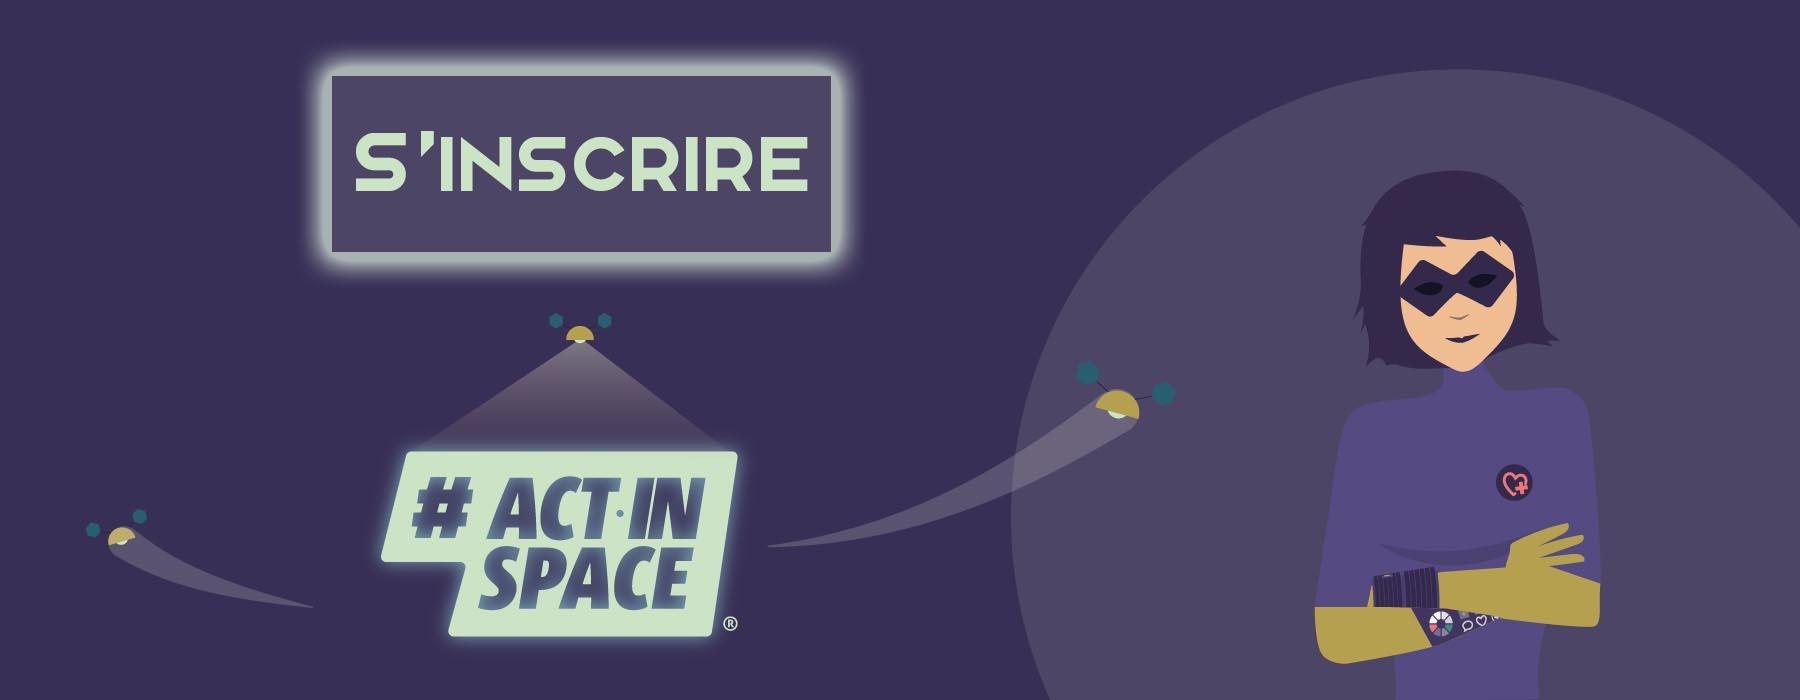 is_inscription-actinspace.jpg